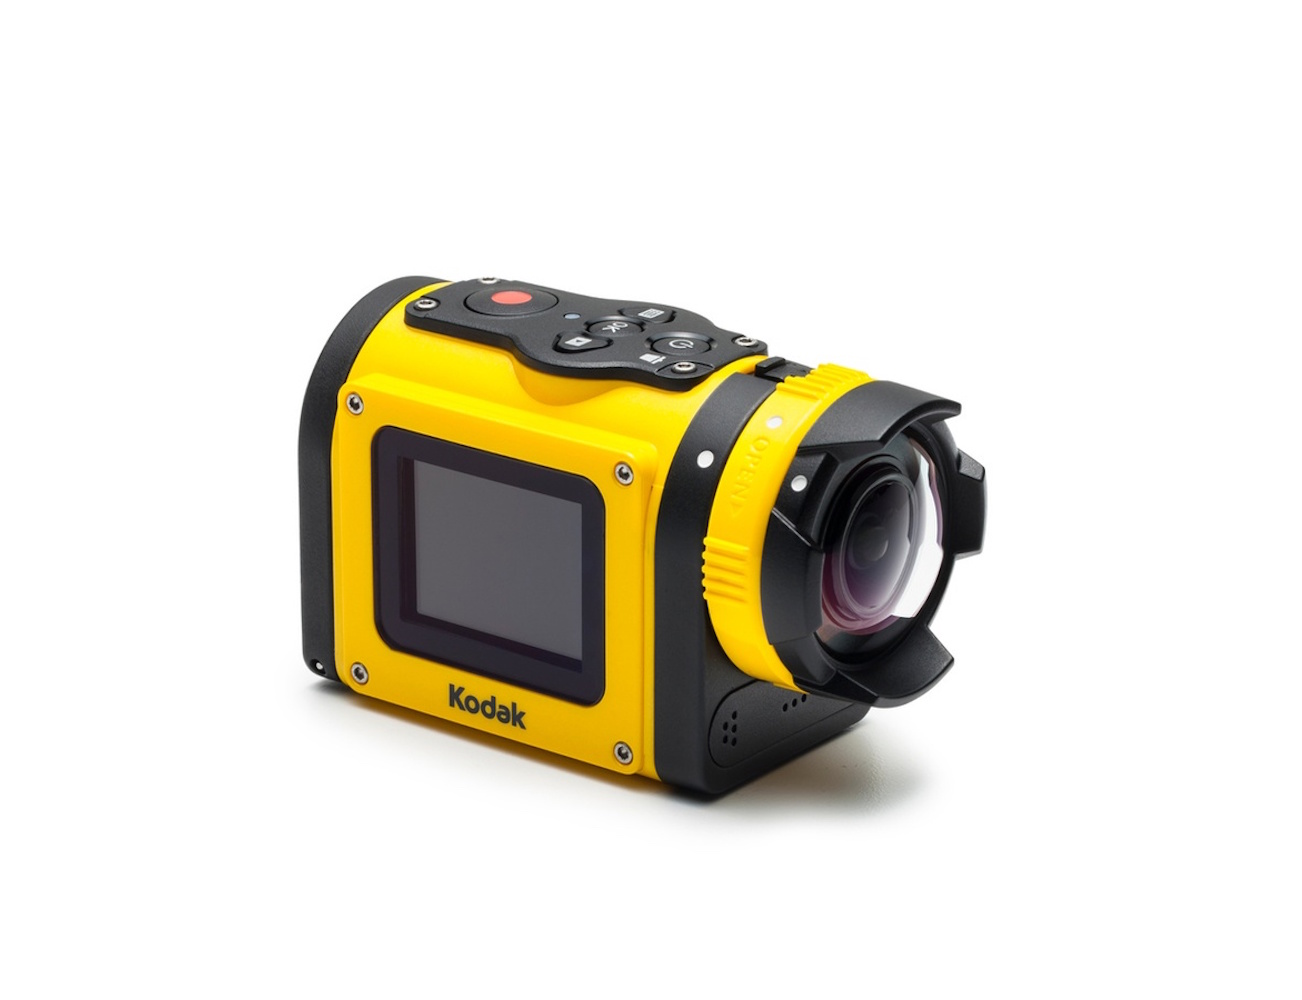 Kodak PIXPRO SP1 Action Cam and Explorer Pack